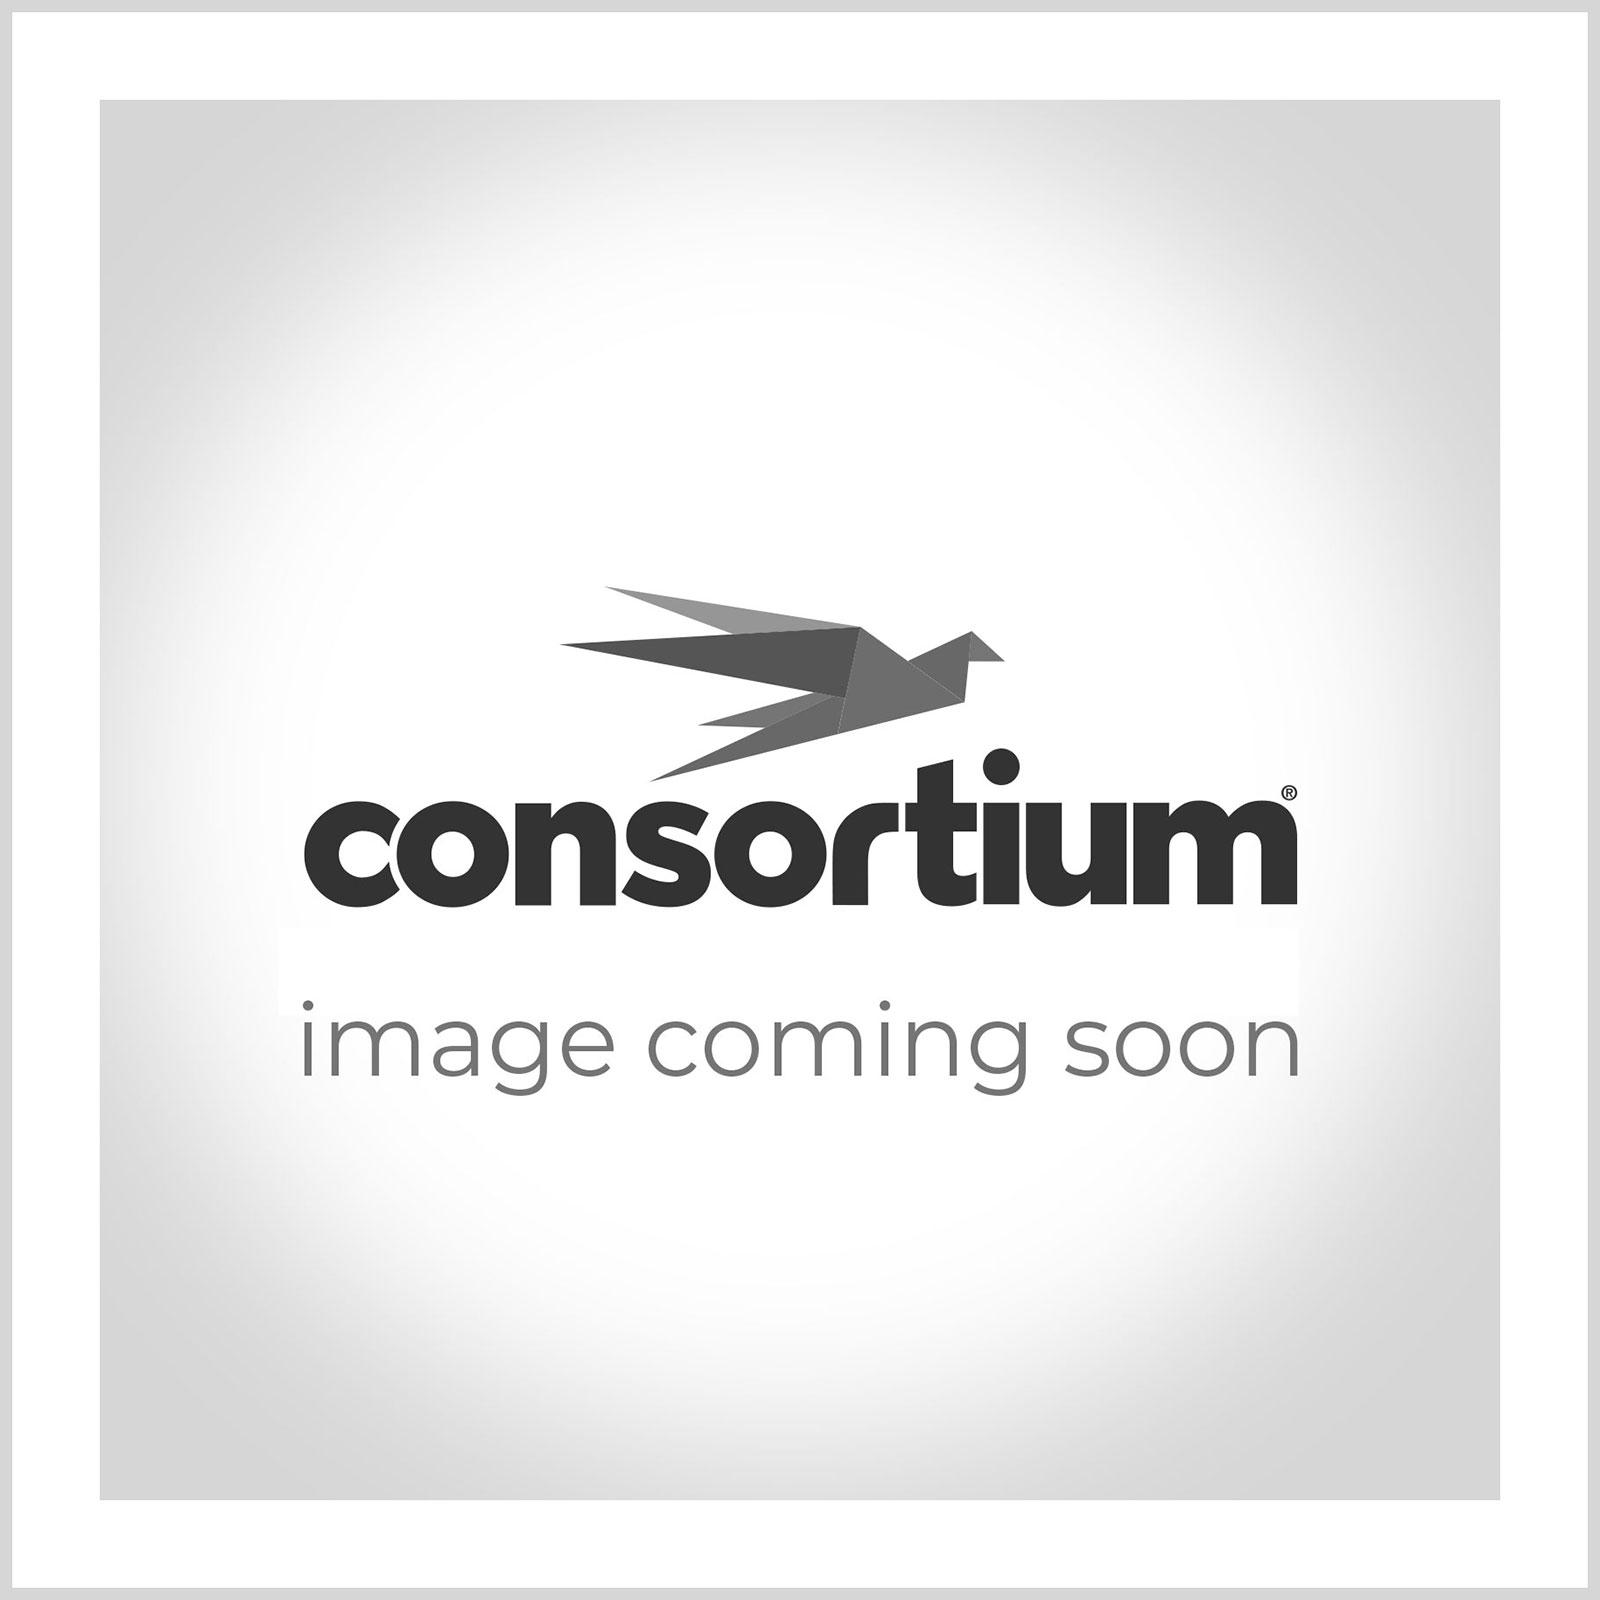 The Consortium Pastel Copier Paper and Card